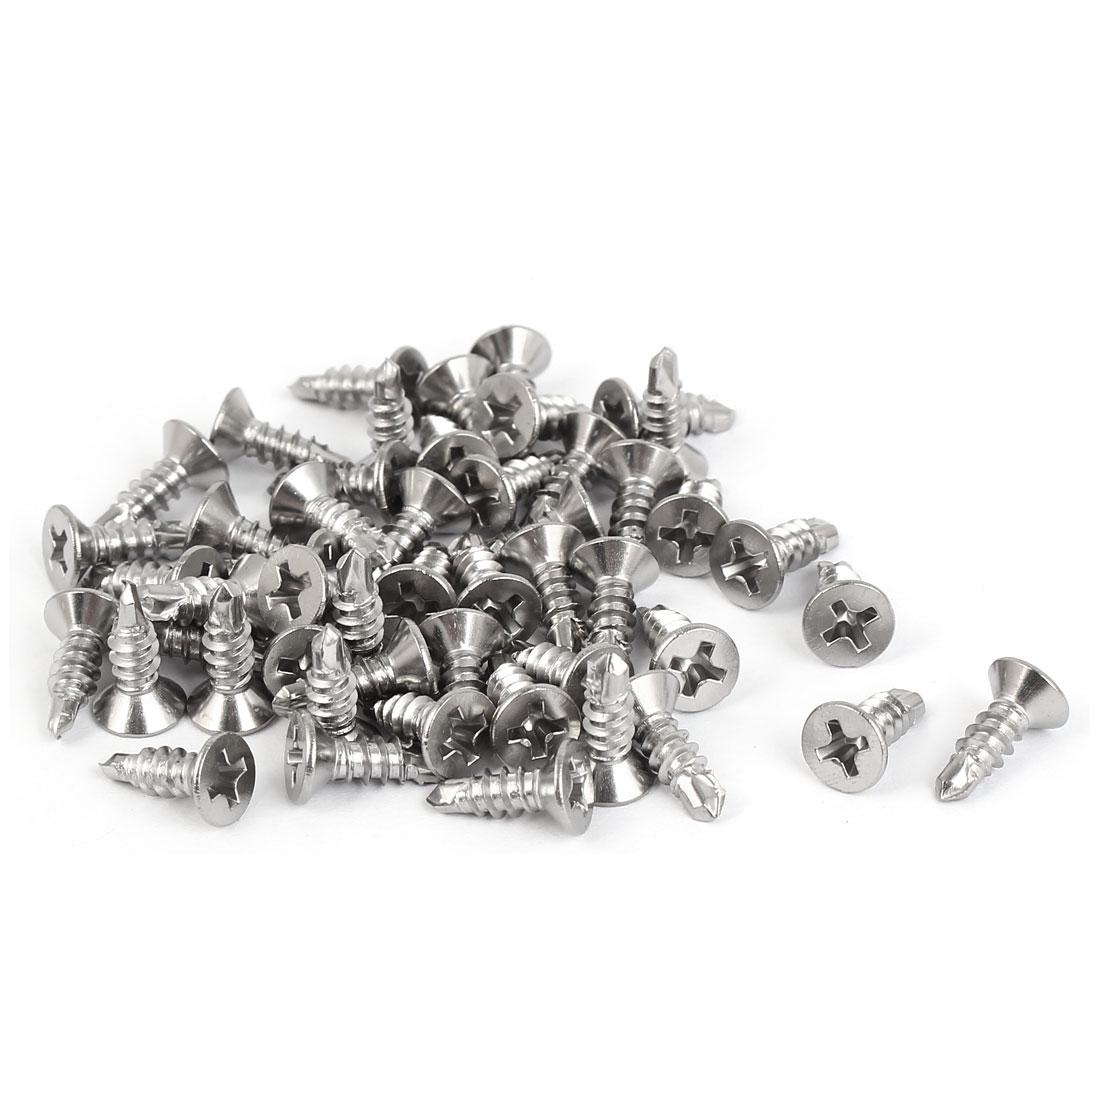 M3.9x13mm #7 Thread 410 Stainless Steel Self Drilling Countersunk Head Screws 50 Pcs